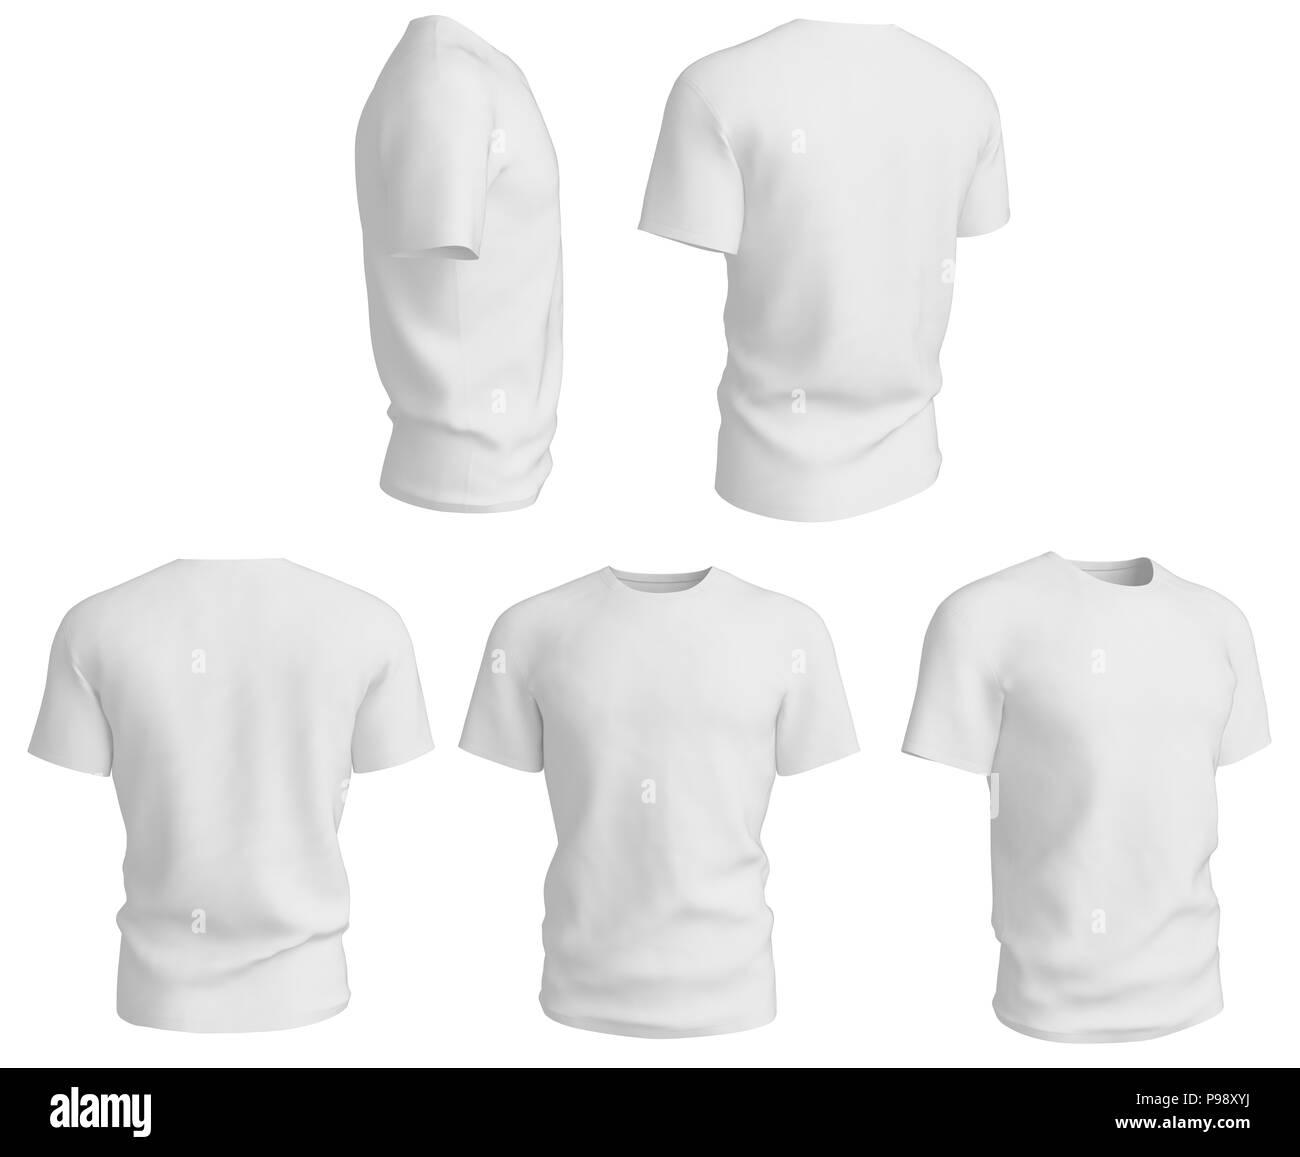 Set of man white t shirts design template isolated on white set of man white t shirts design template isolated on white background 3d render maxwellsz